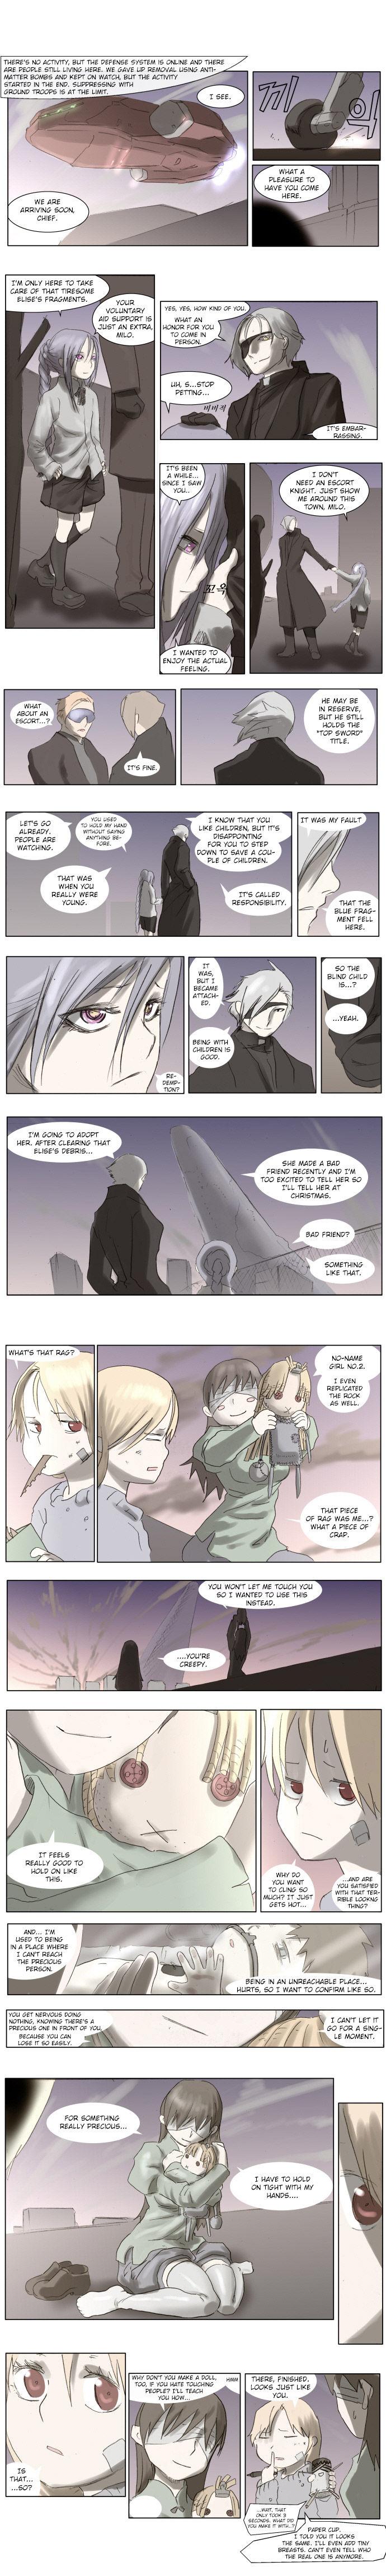 Knight Run 61 Page 2